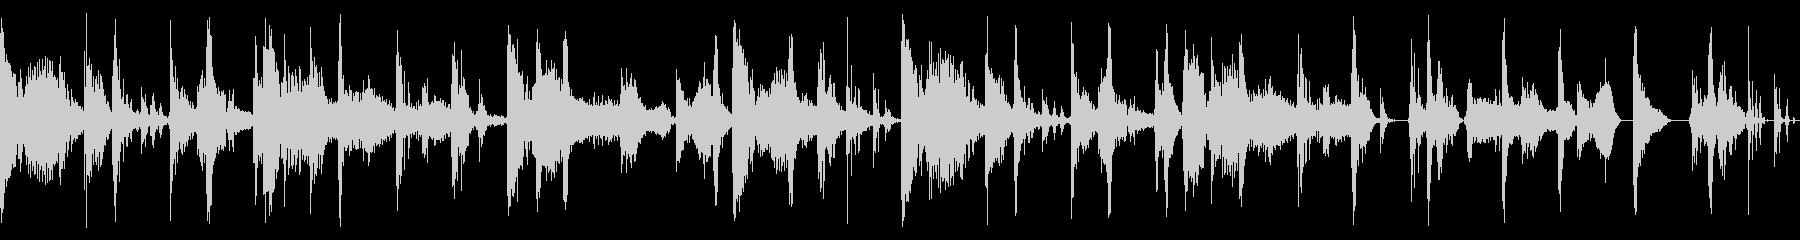 2-stepのリズムにファンクの未再生の波形